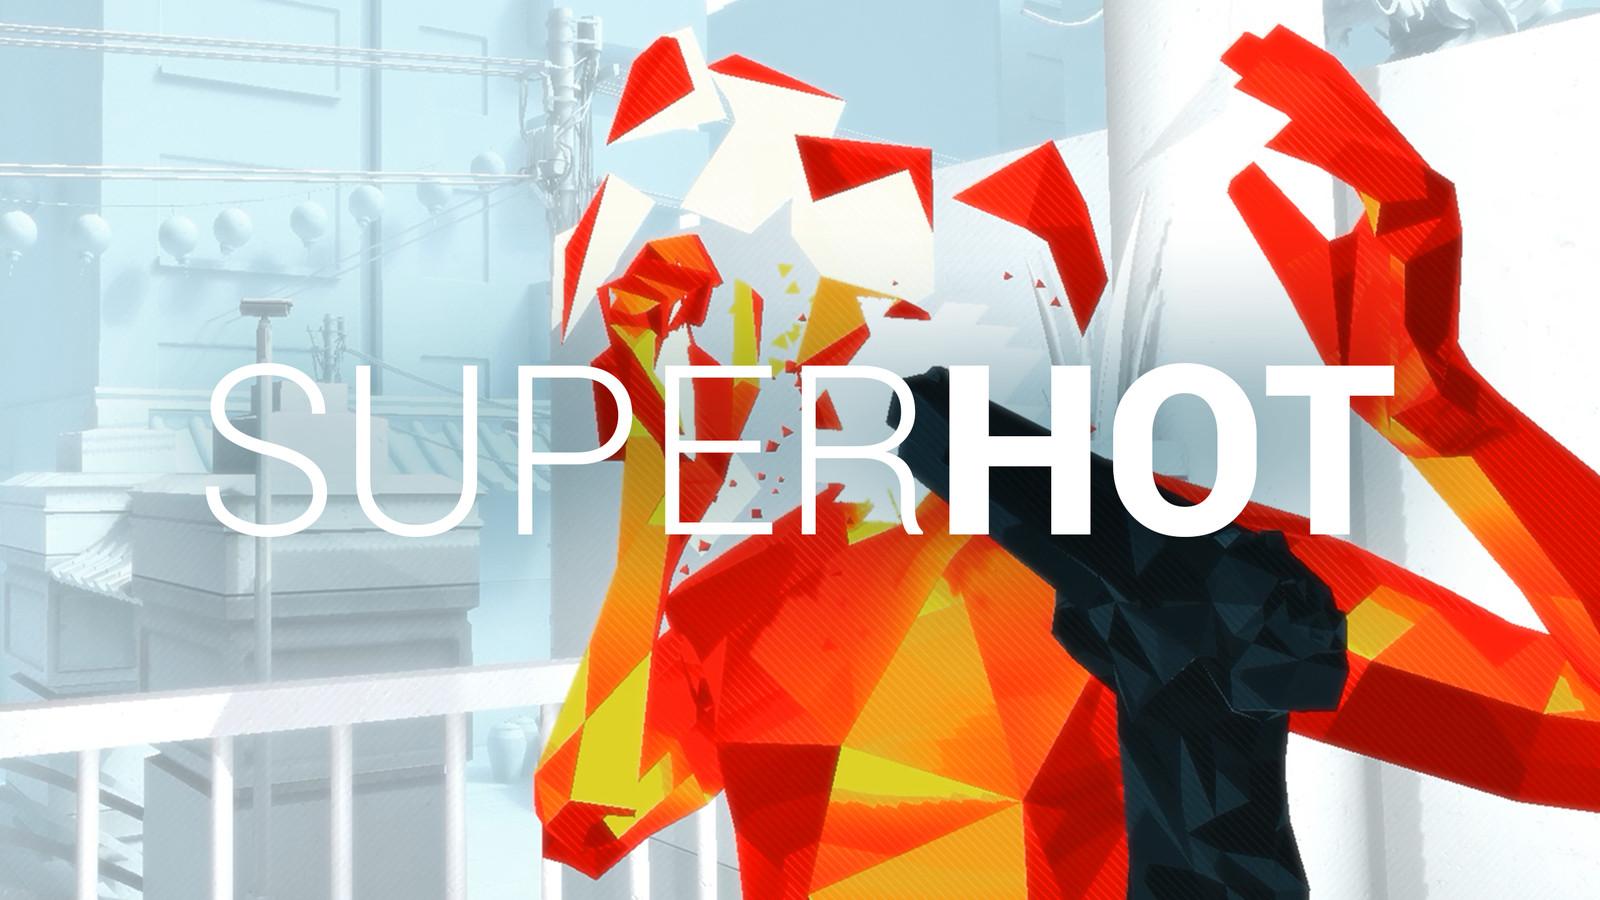 Superhor